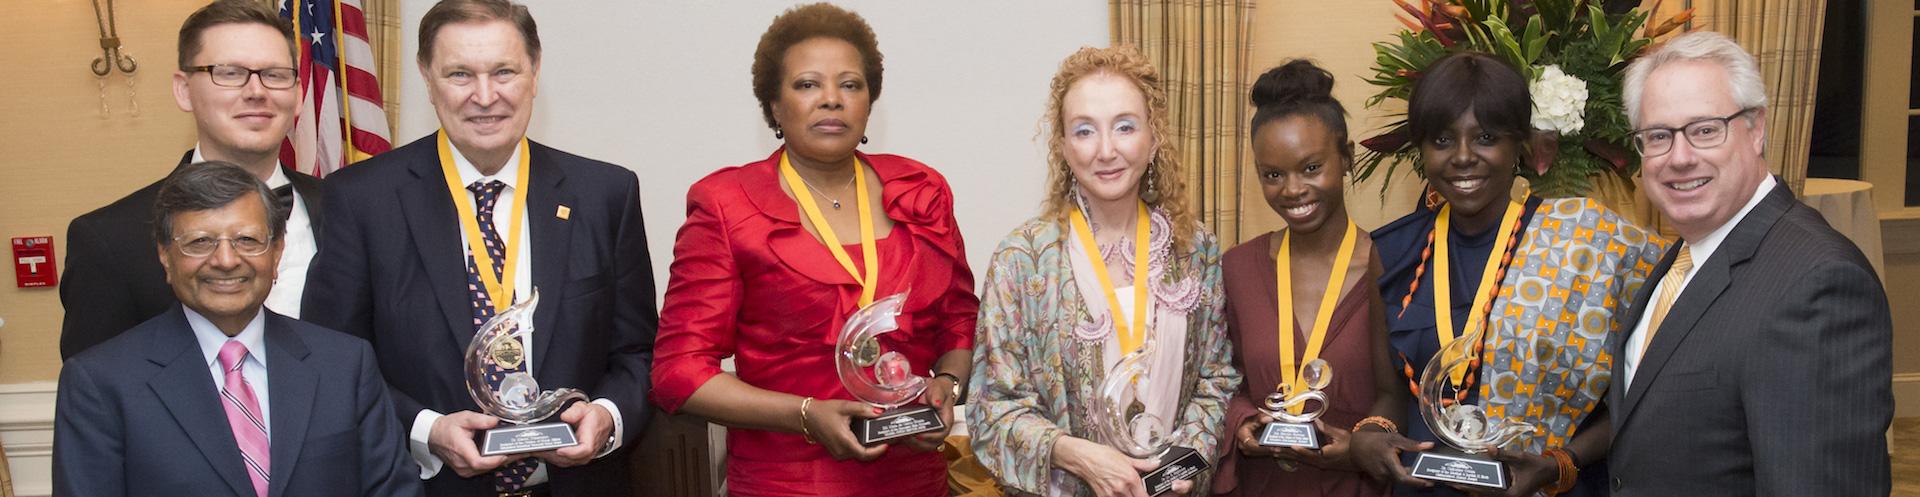 2017_International_Awards_dc7 rotatomaria do Carmo Silveira r